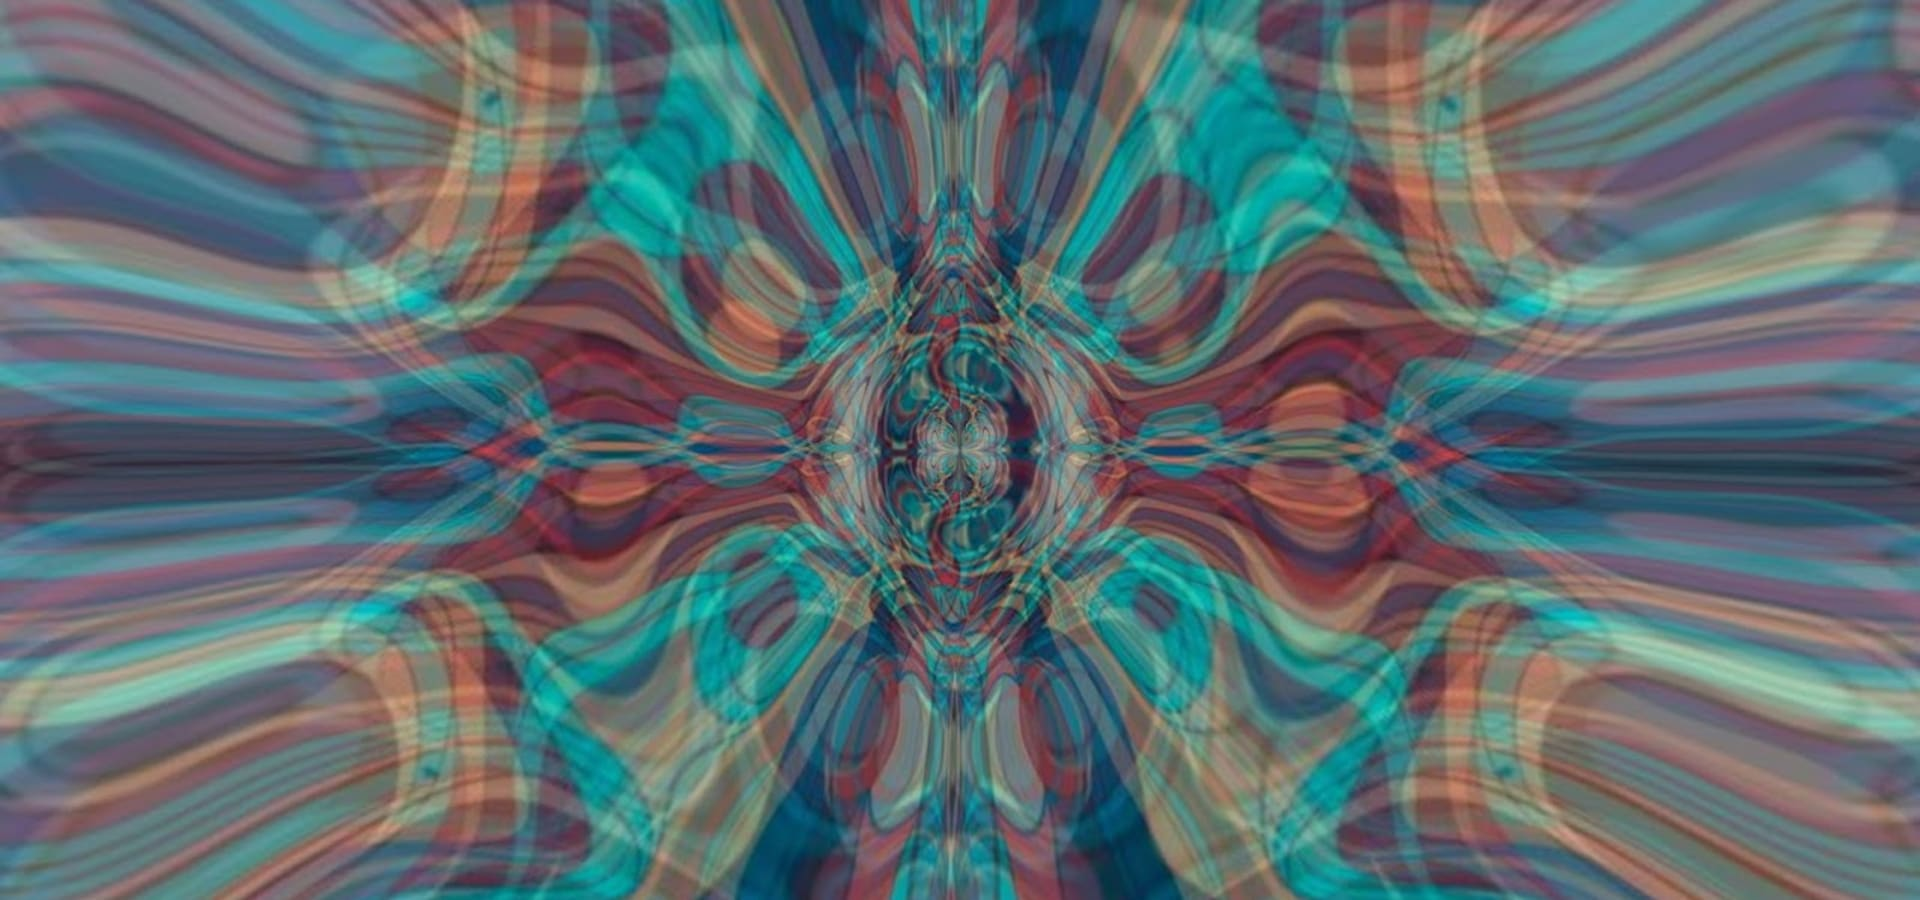 BORIS WECK :: ARIADNE Studio :: Topological Interior Design via Digital Transformation and QR ARt